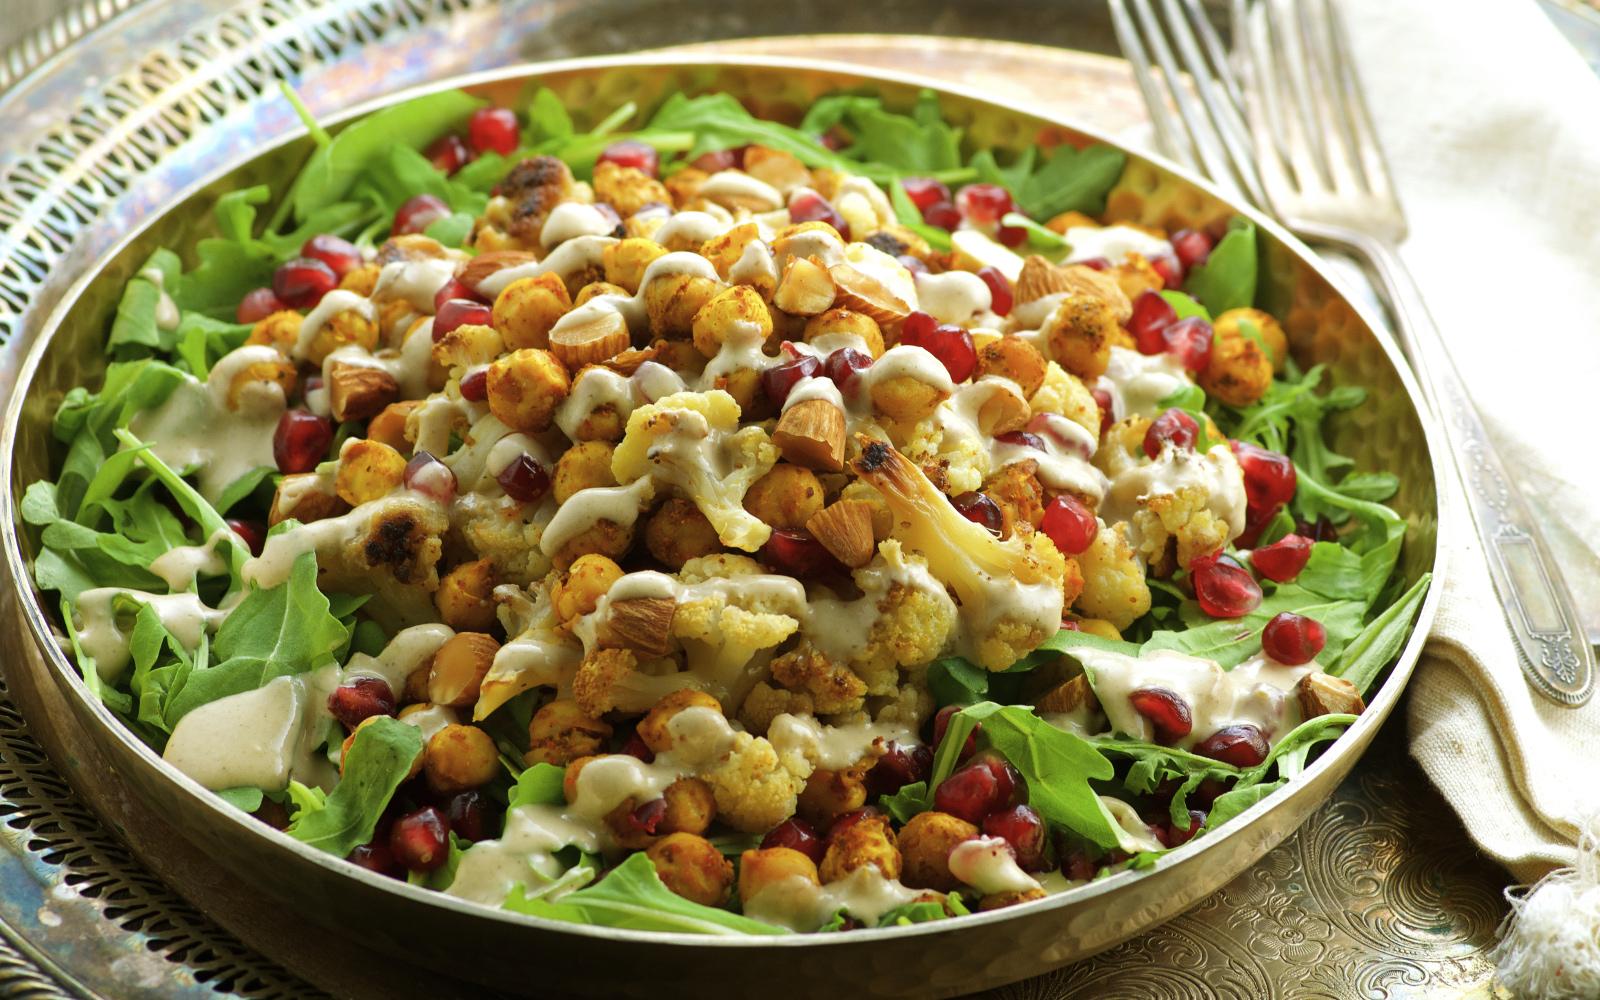 Roasted Cauliflower and Spiced Chickpea Salad